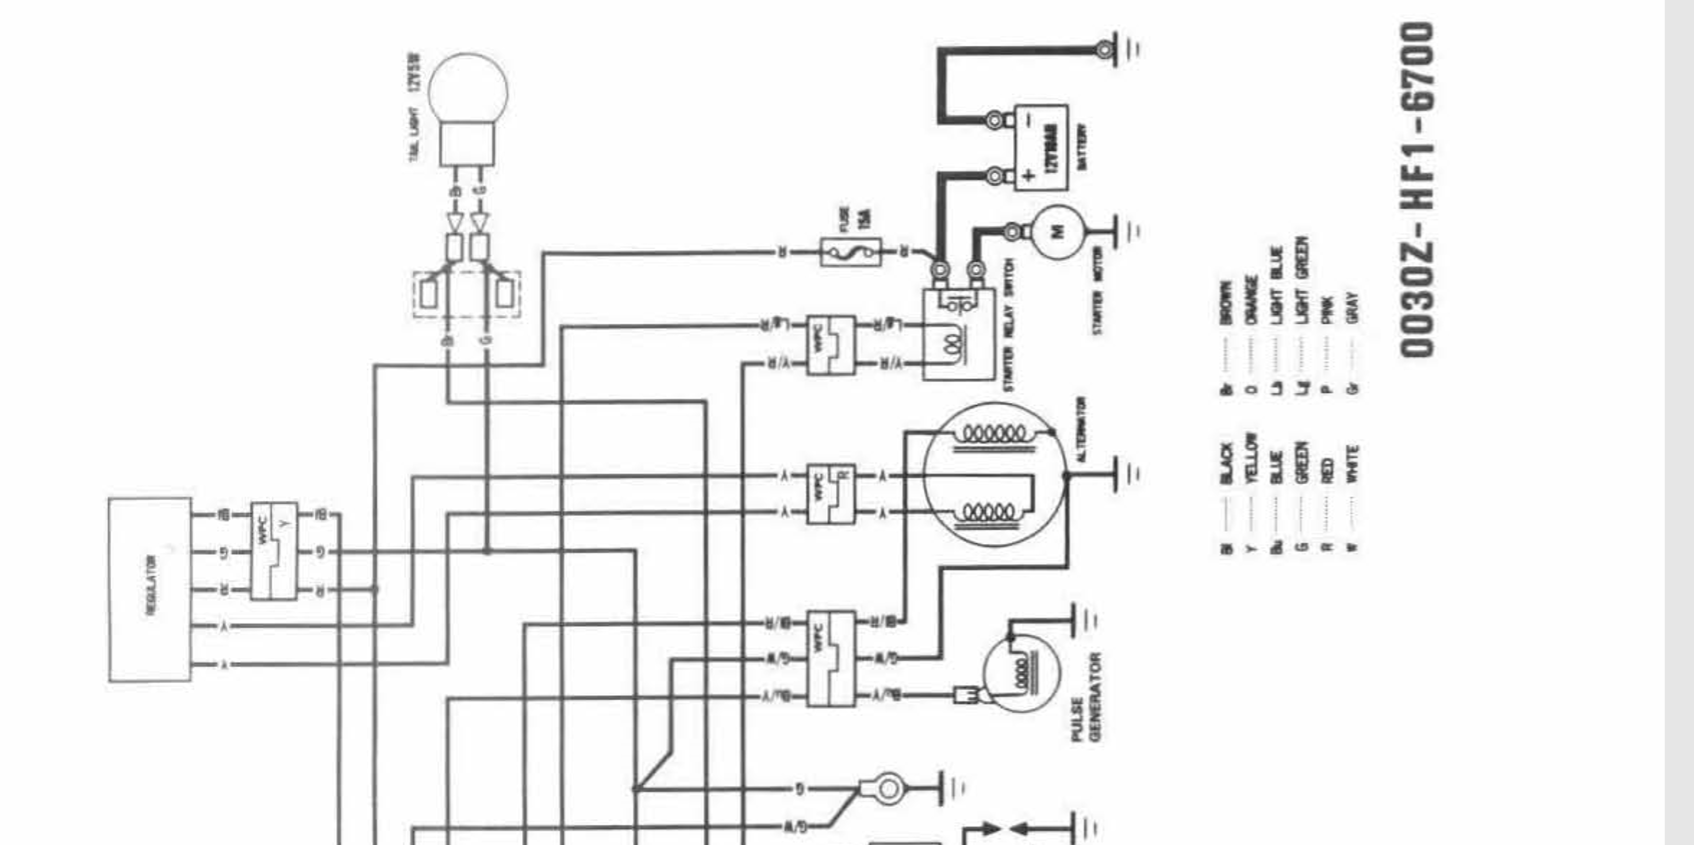 1987 honda trx350d wiring diagram  honda  auto wiring diagram